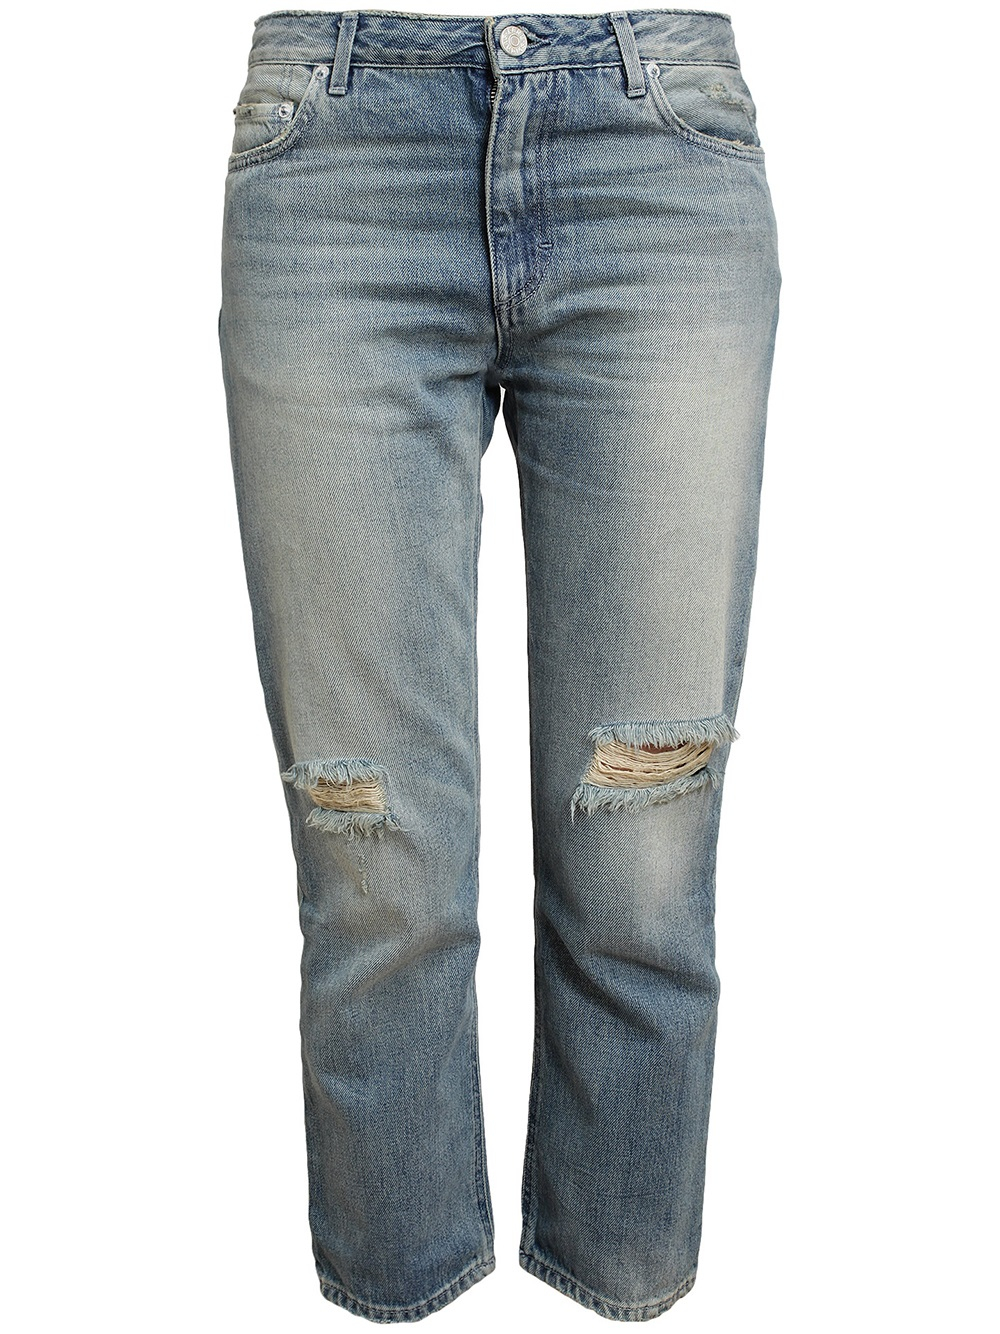 Lyst - Acne Studios Pop Trash Distressed Denim Jeans in Blue